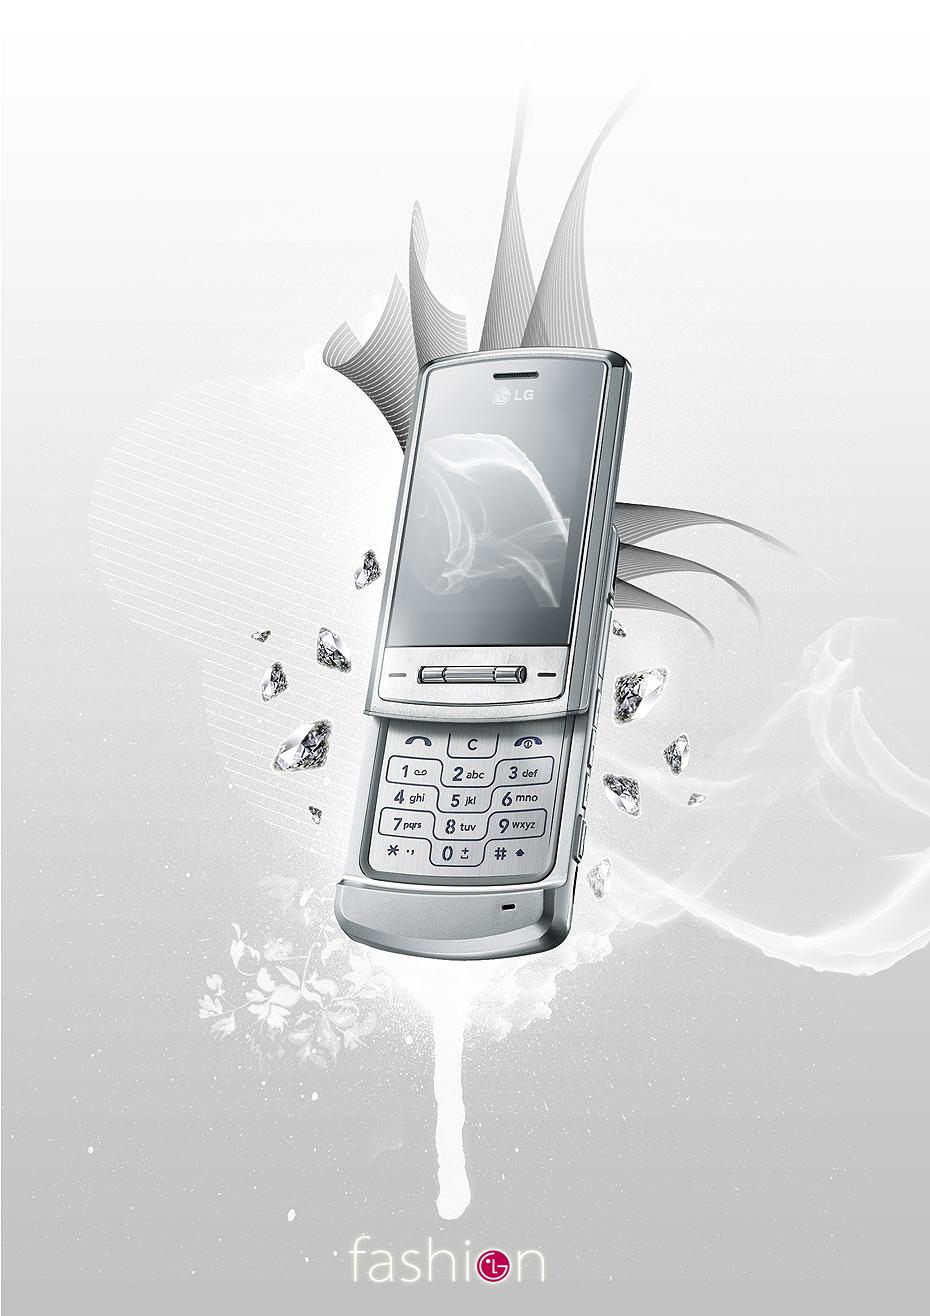 LG Shine ad by gcjo182